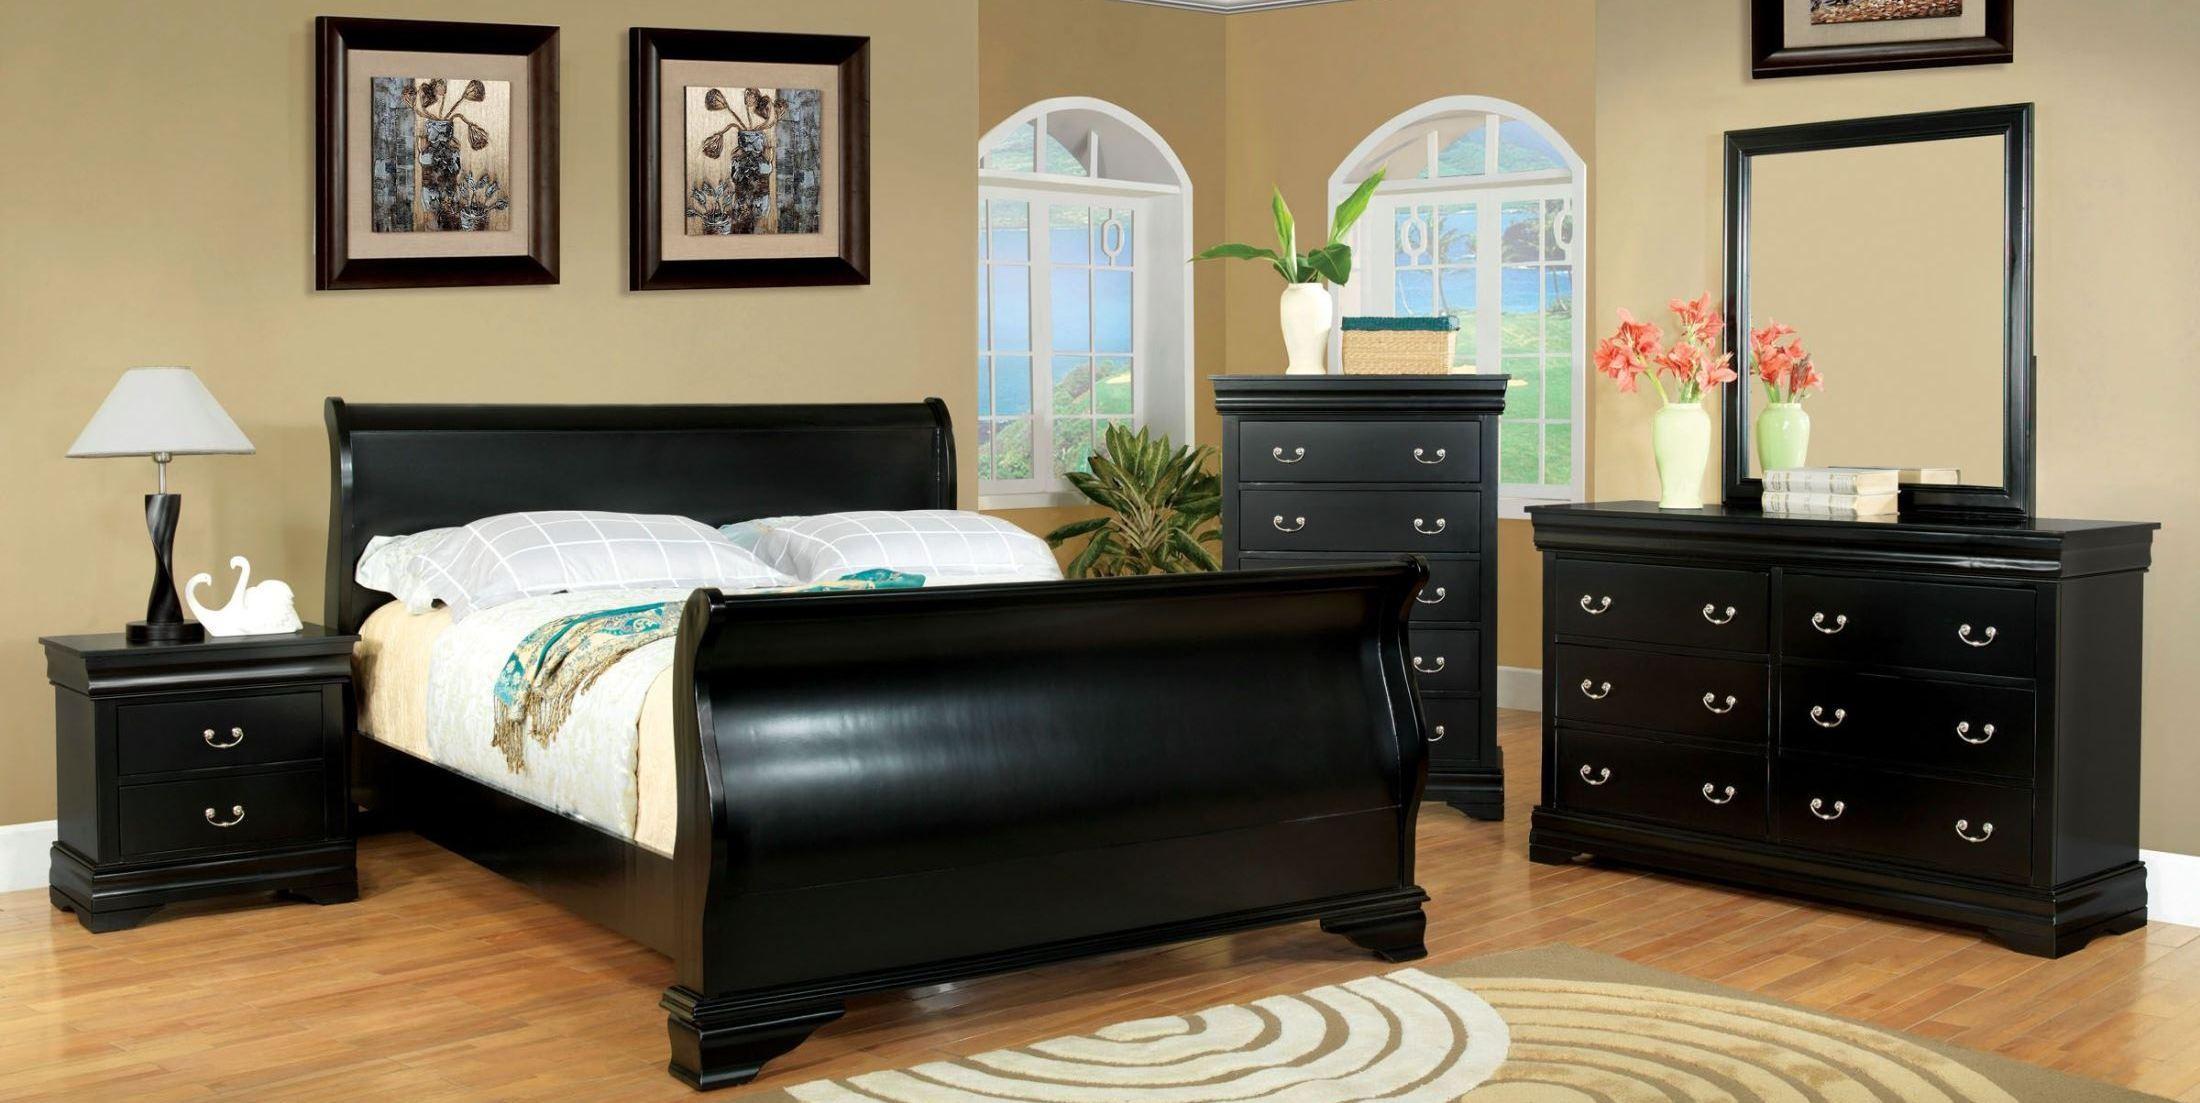 laurelle black sleigh bedroom set from furniture of madera ebony black sleigh bedroom set 545 52 60 62